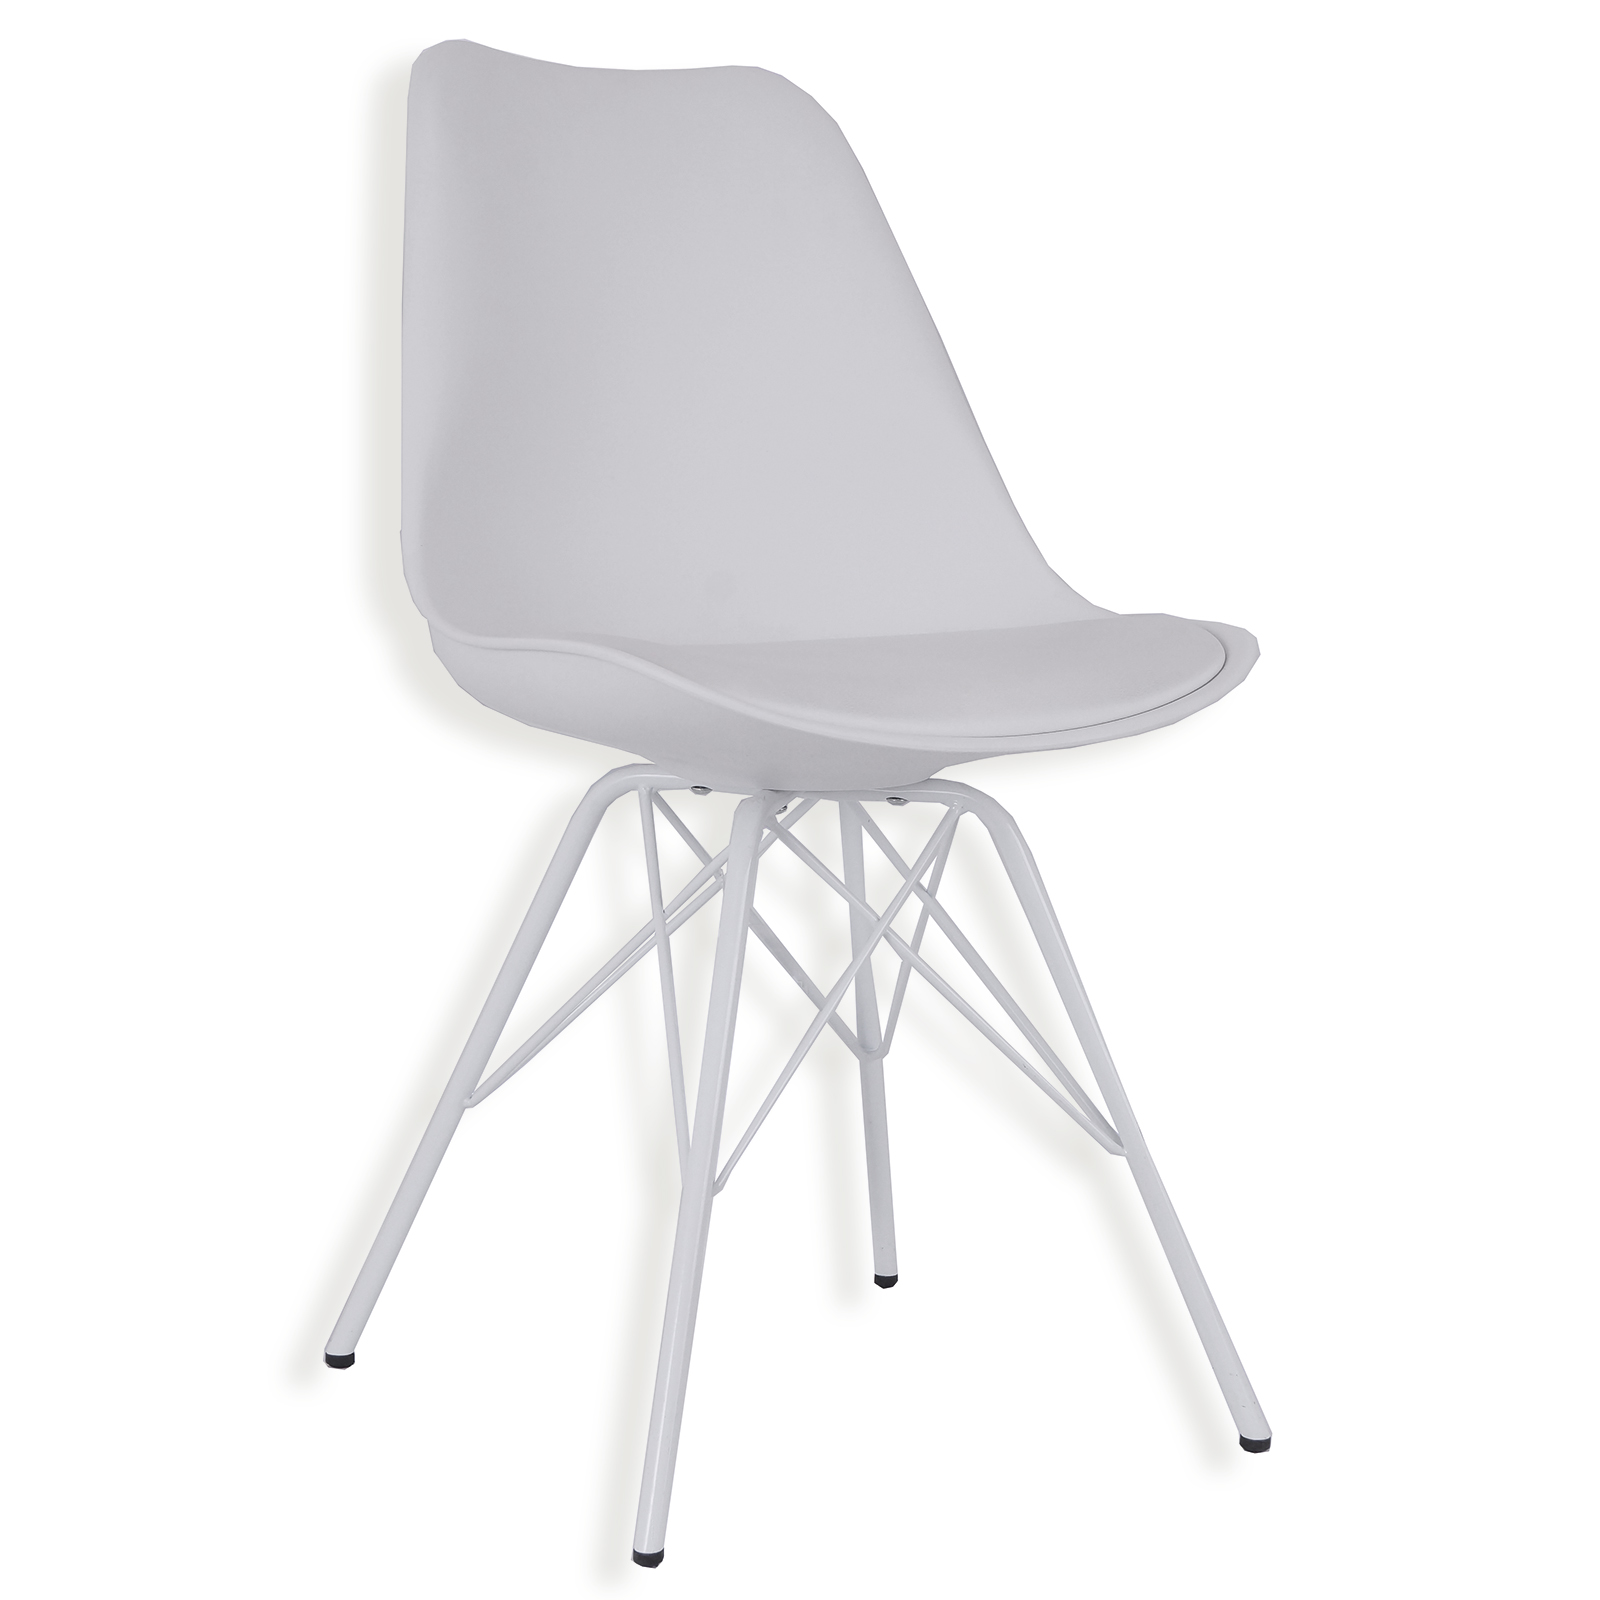 Stuhl Weiß Kunstleder